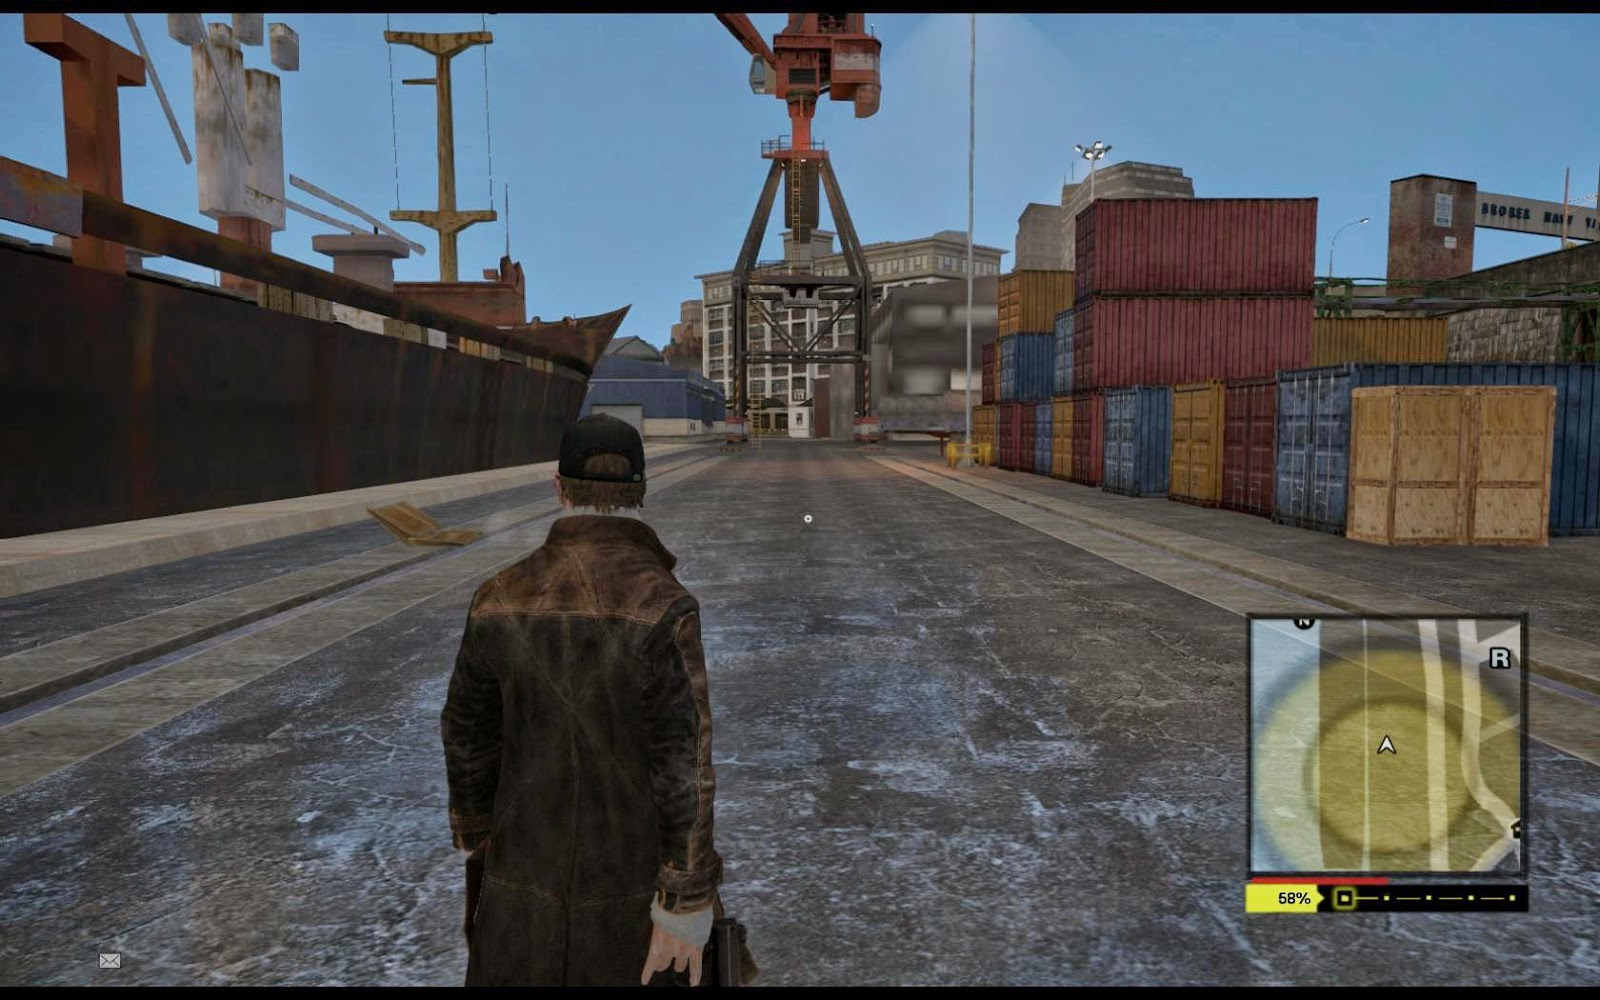 GTA IV Mod - WatchDogsIV Download